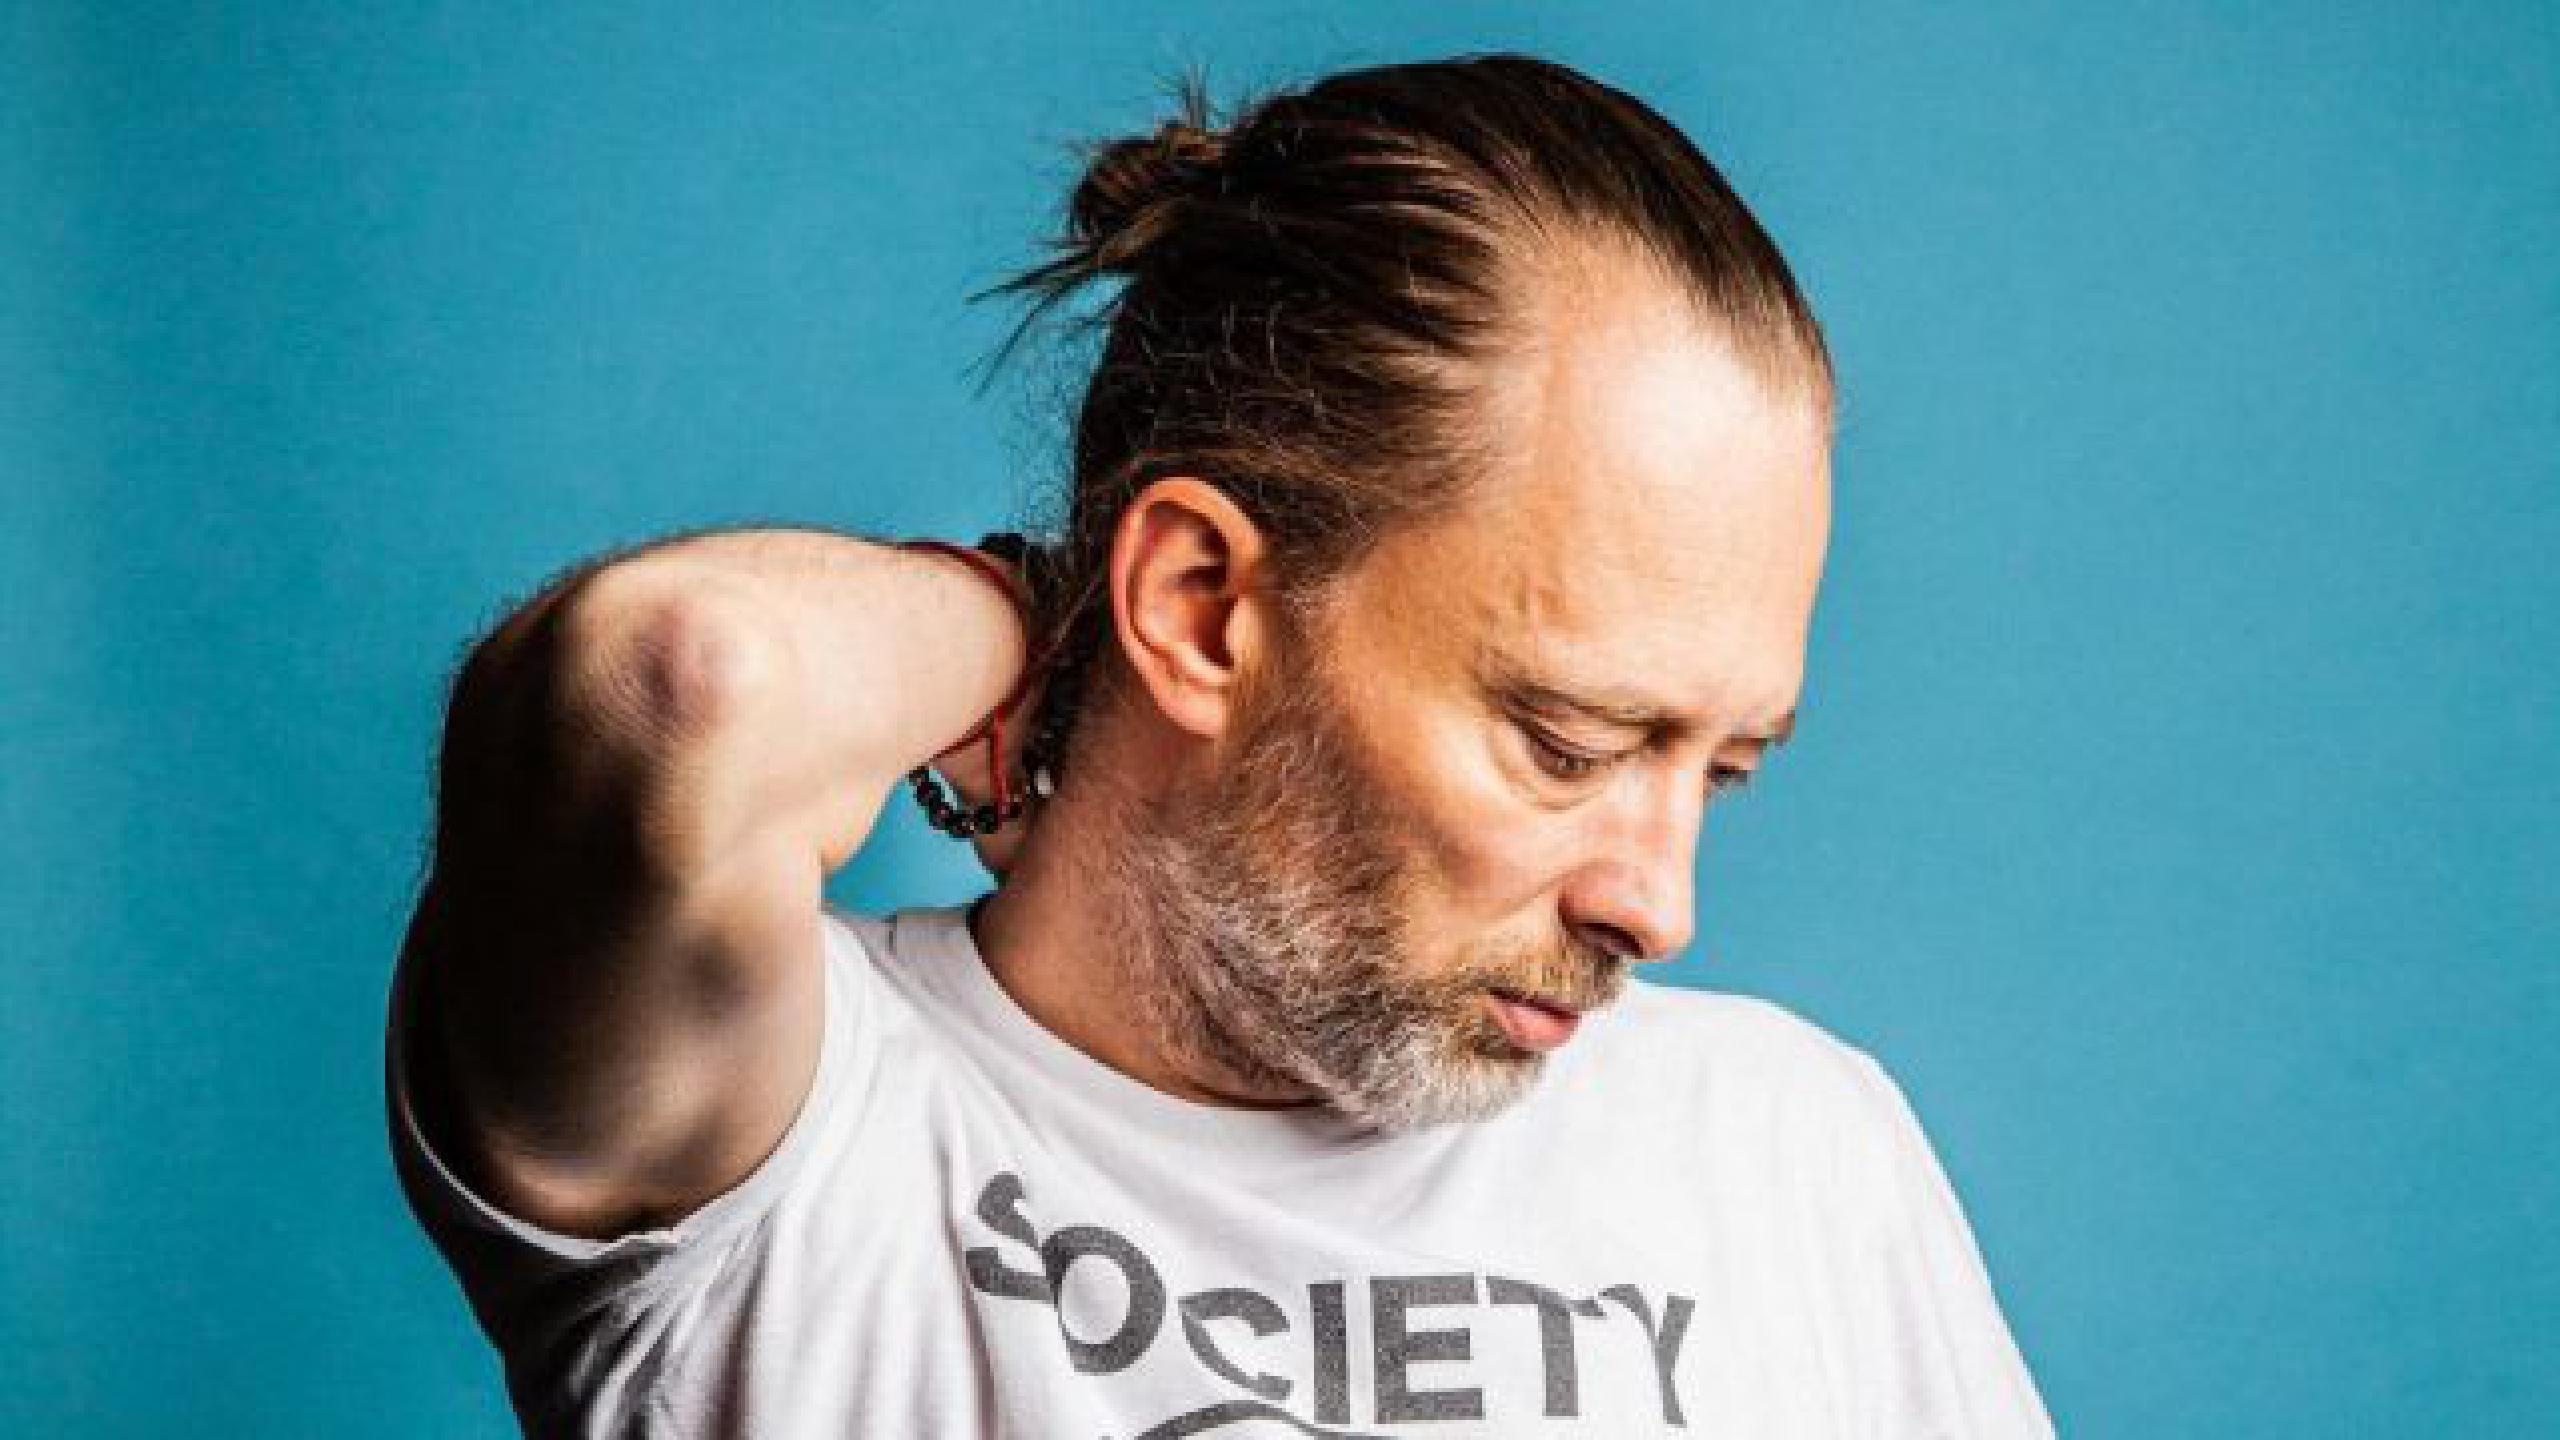 radiohead concert live dublin